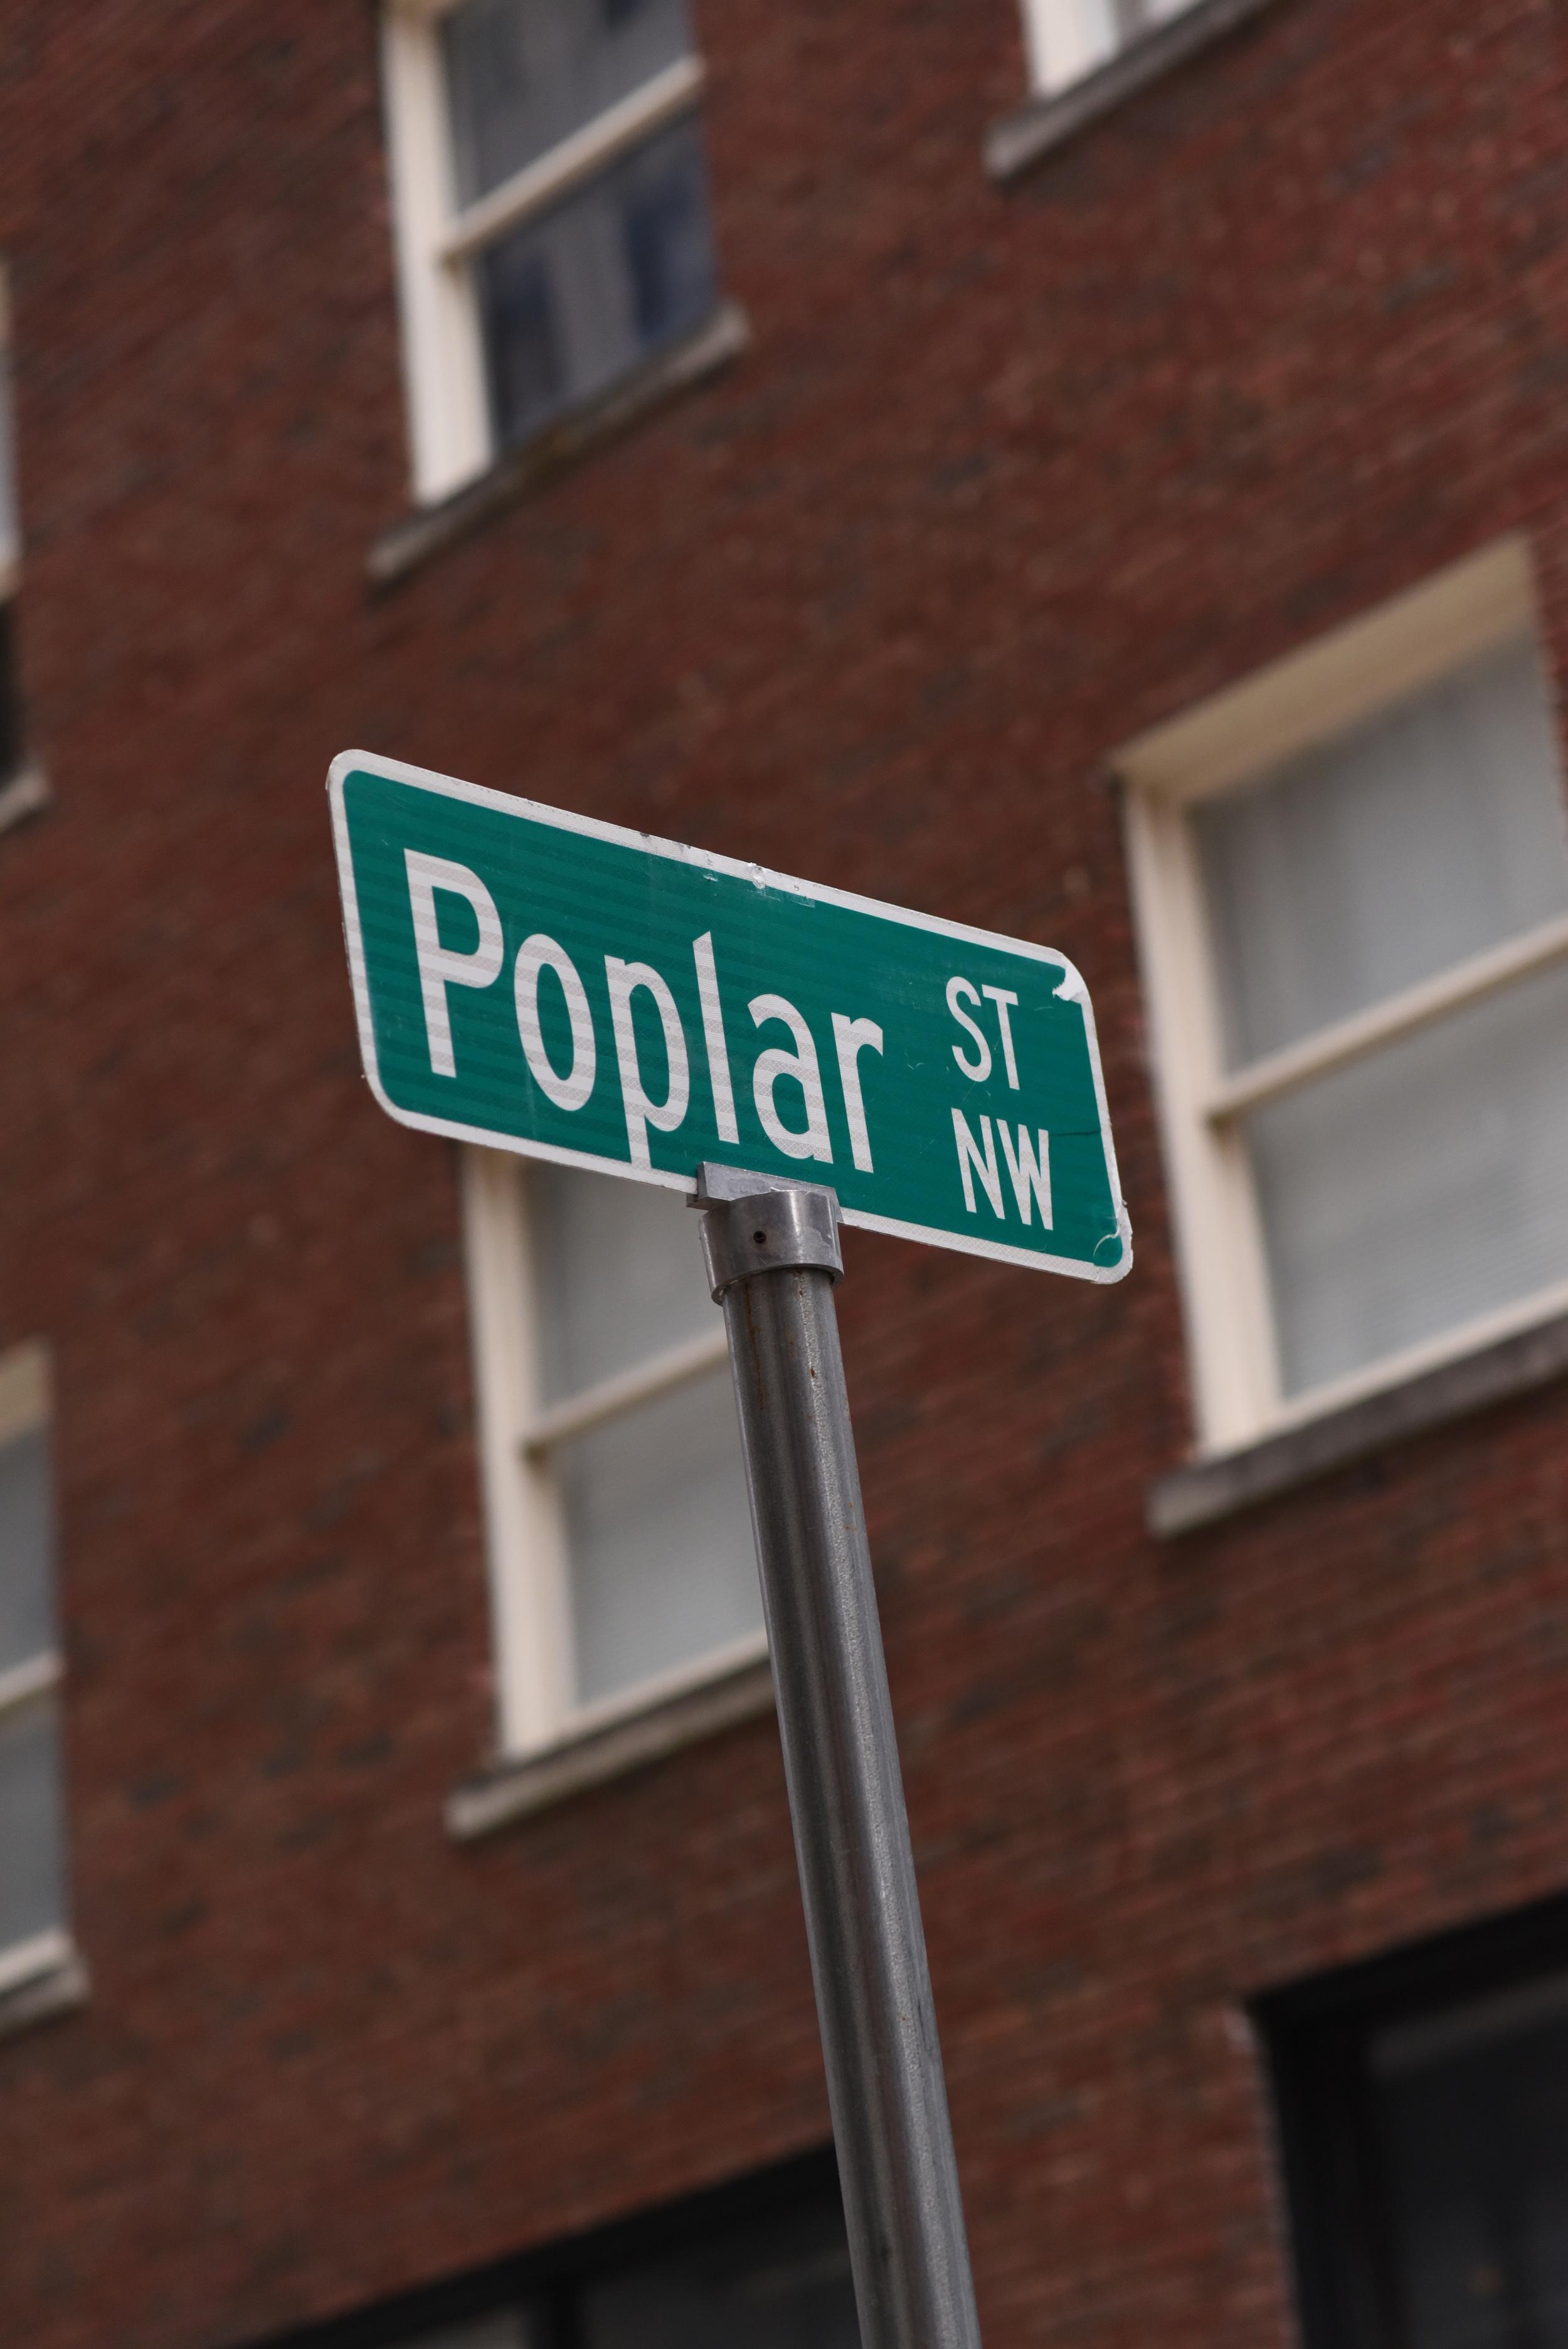 poplar-street-sign.jpg